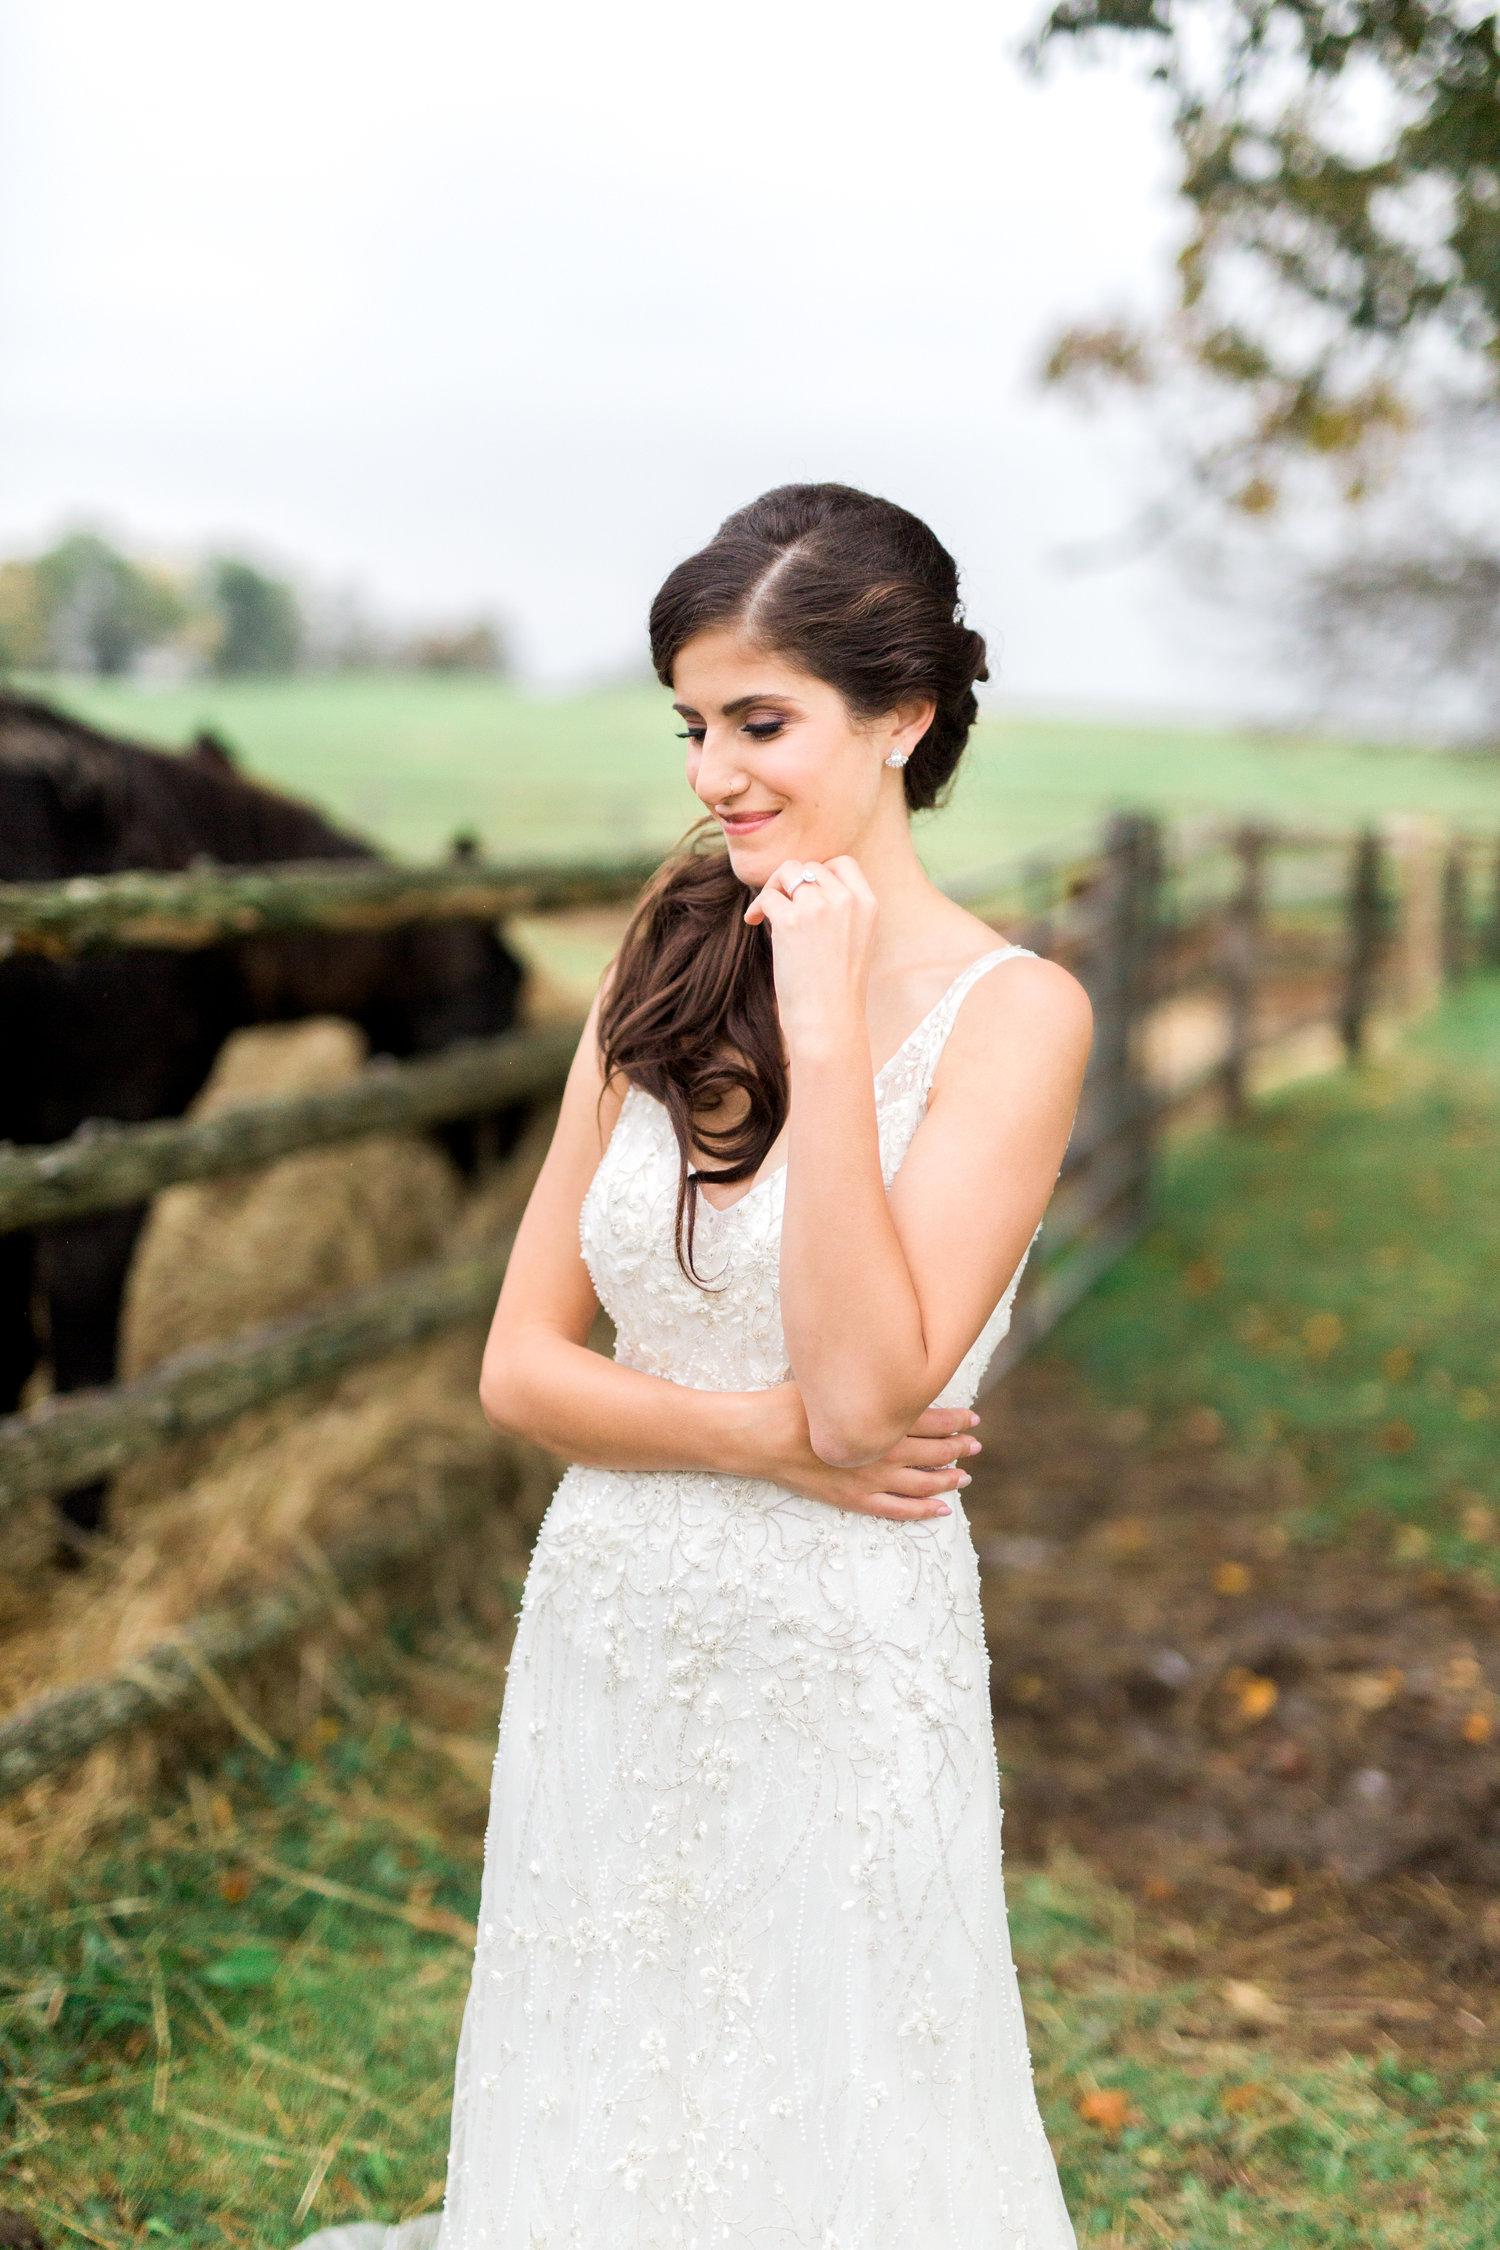 Amir-Golbazi-Danielle-Giroux-Photography_Toronto-Wedding_Cedarwood_Rachel-Paul_521.jpg